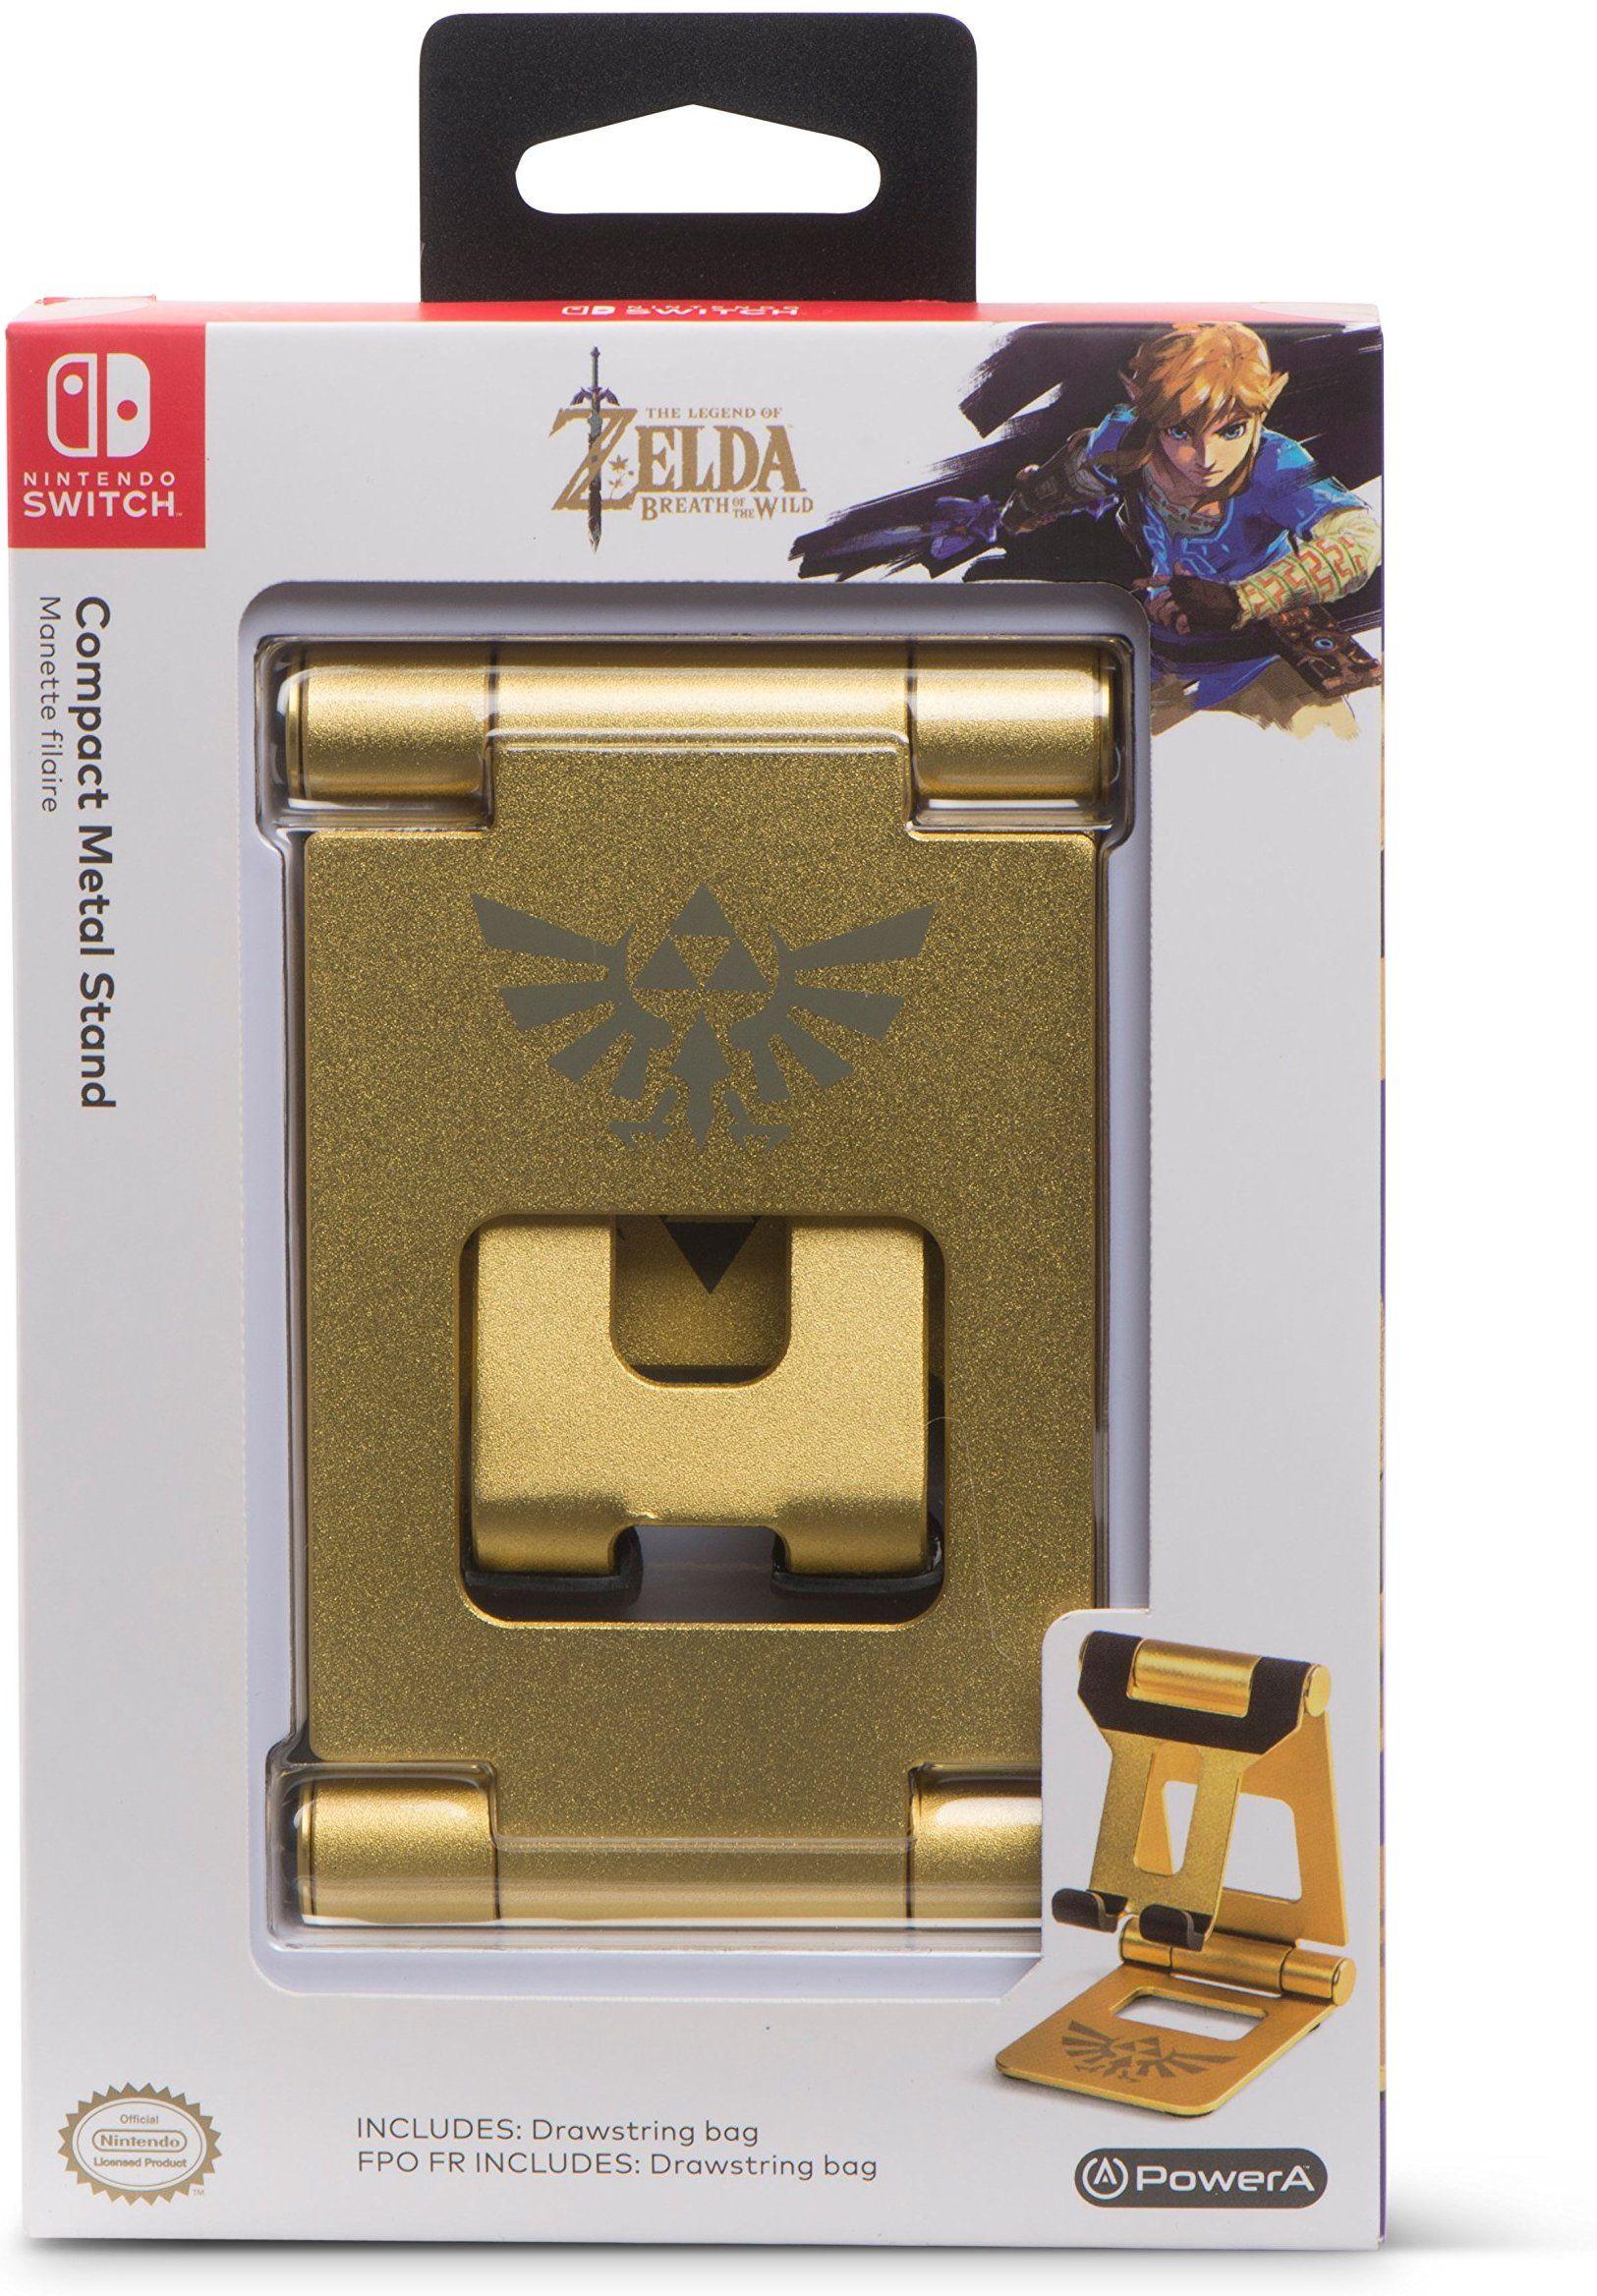 PowerA pact Metal Stand Zelda Breath of The Wild Gold Nintendo Switch